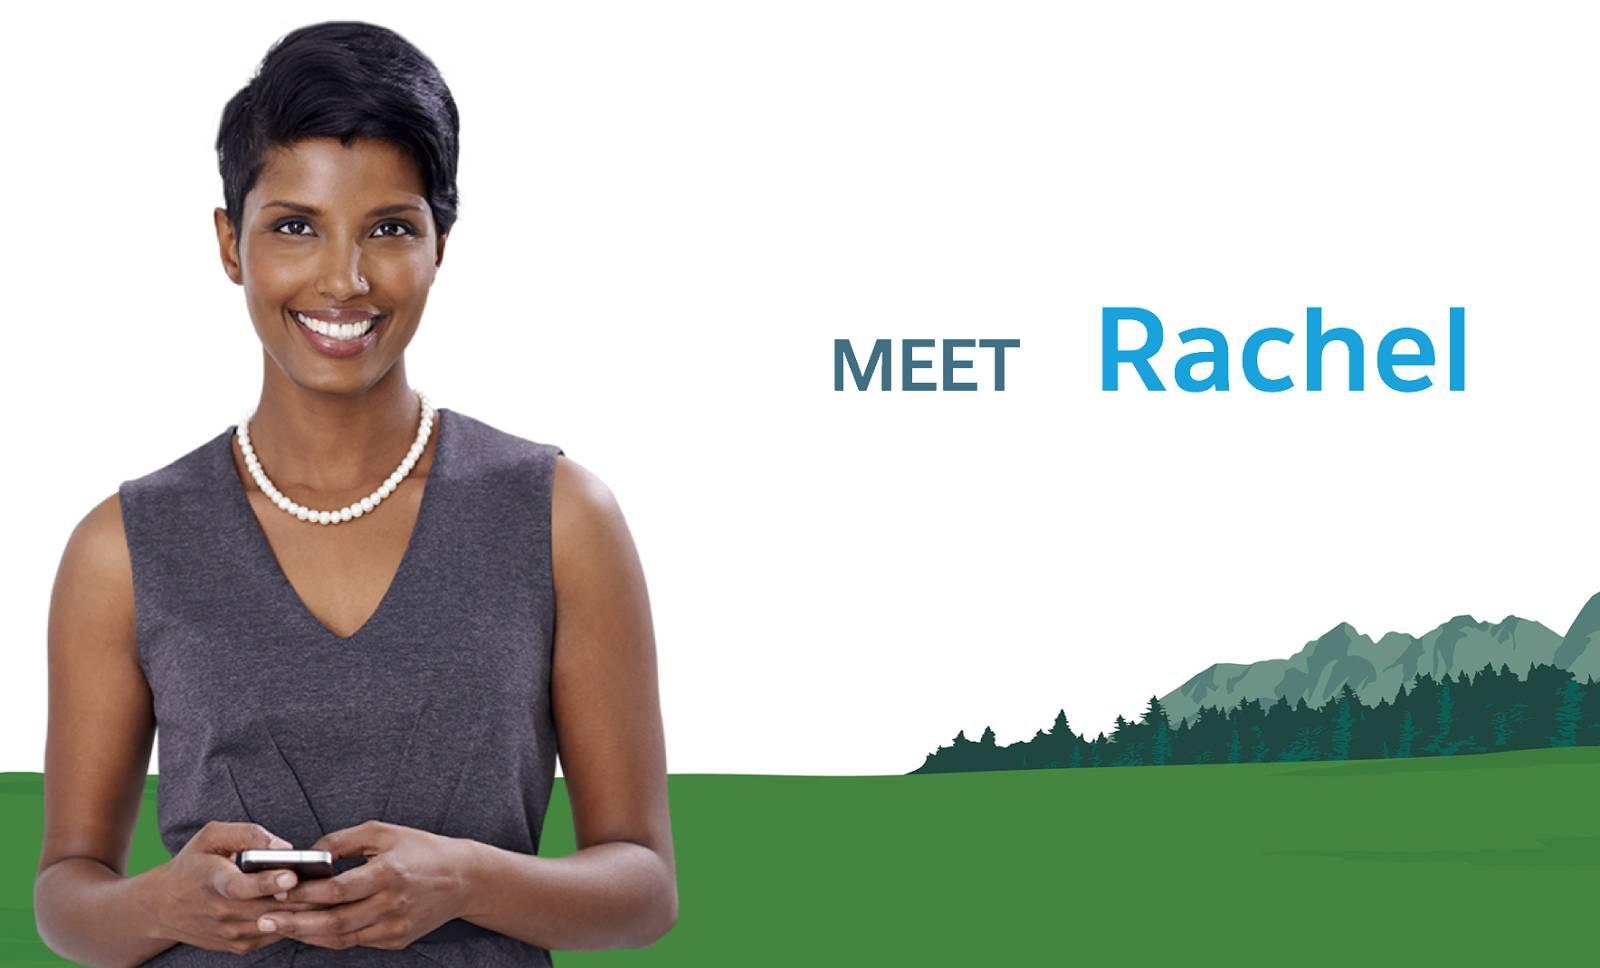 「Meet Rachel」(Rachel を紹介します) というキャプションの付いた Rachel の写真